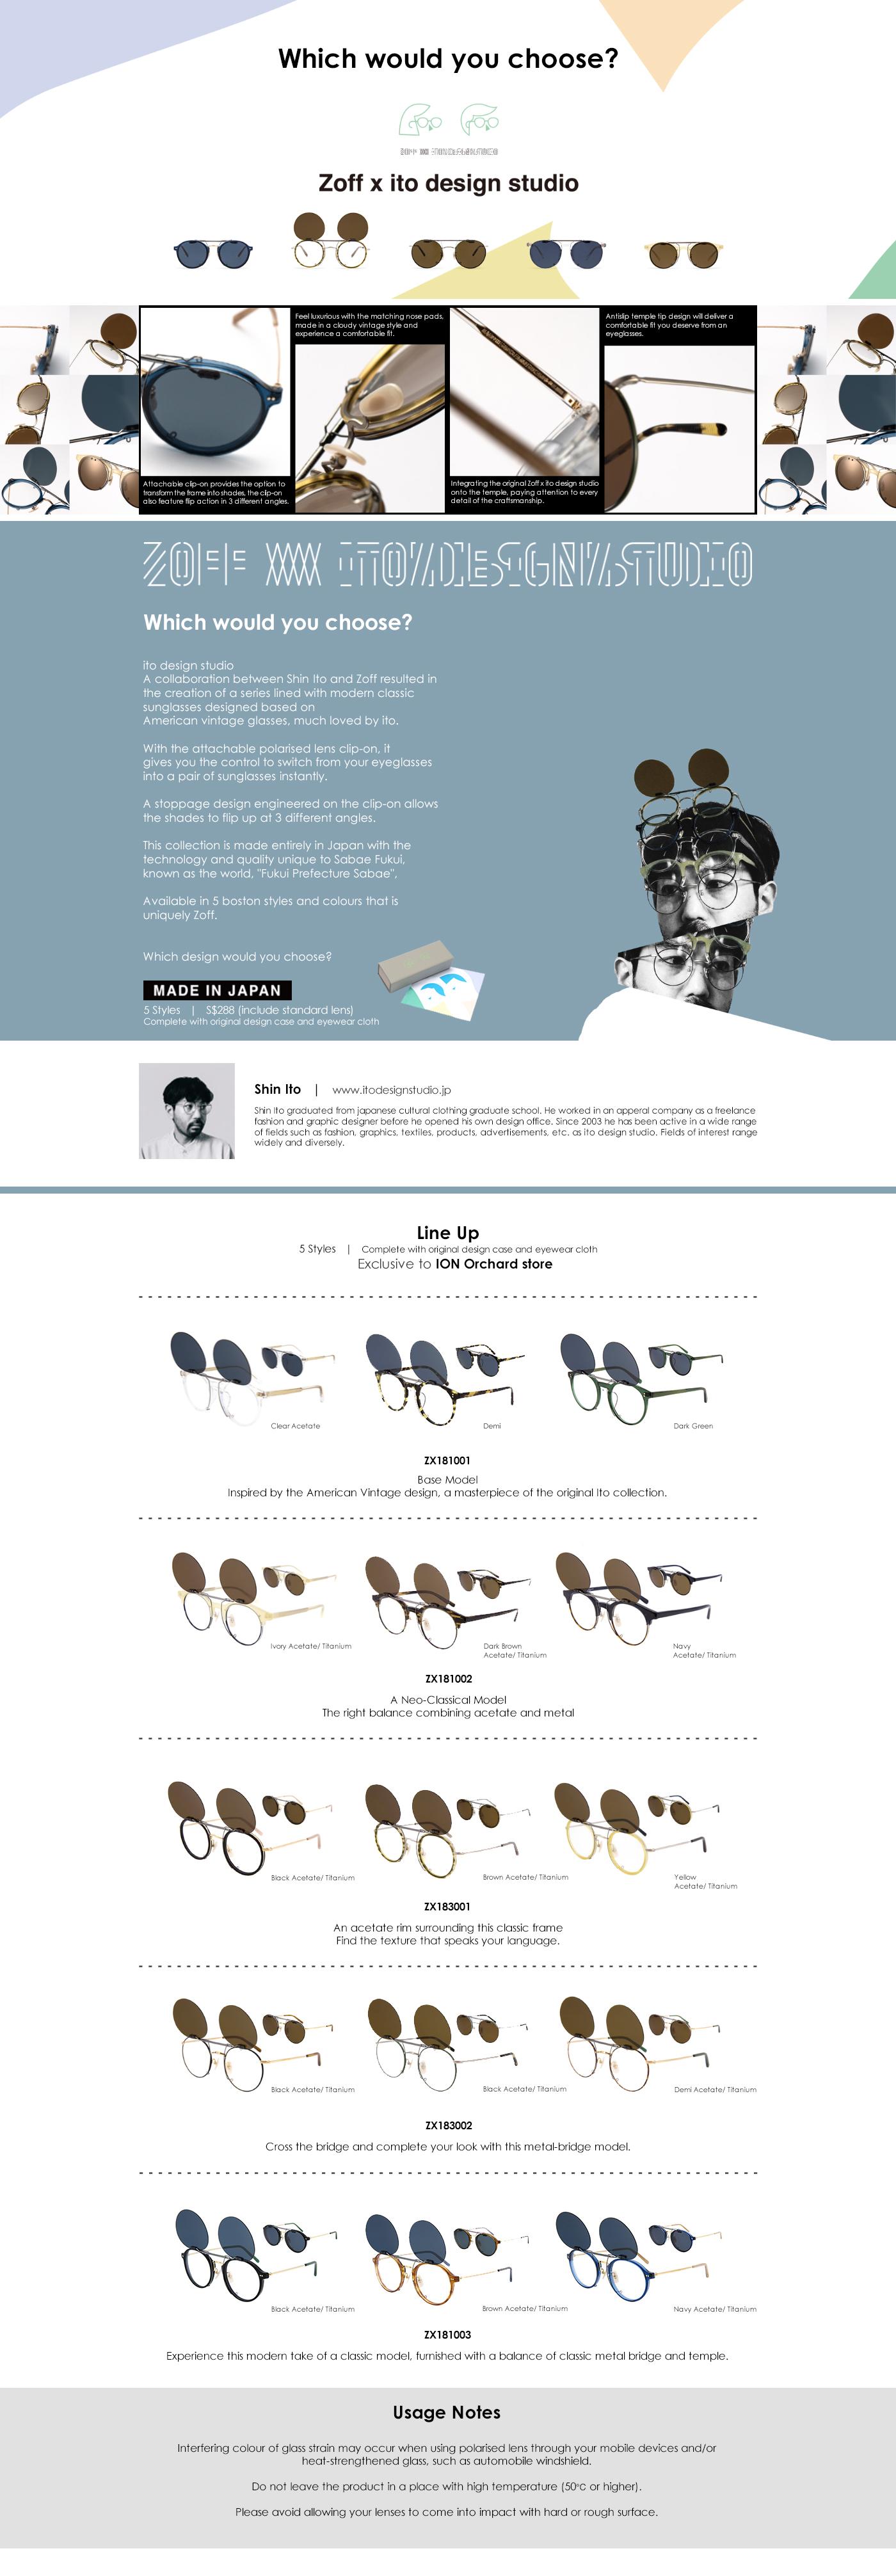 Collection Page - Zoff by ito design studio, clip-on sunglasses